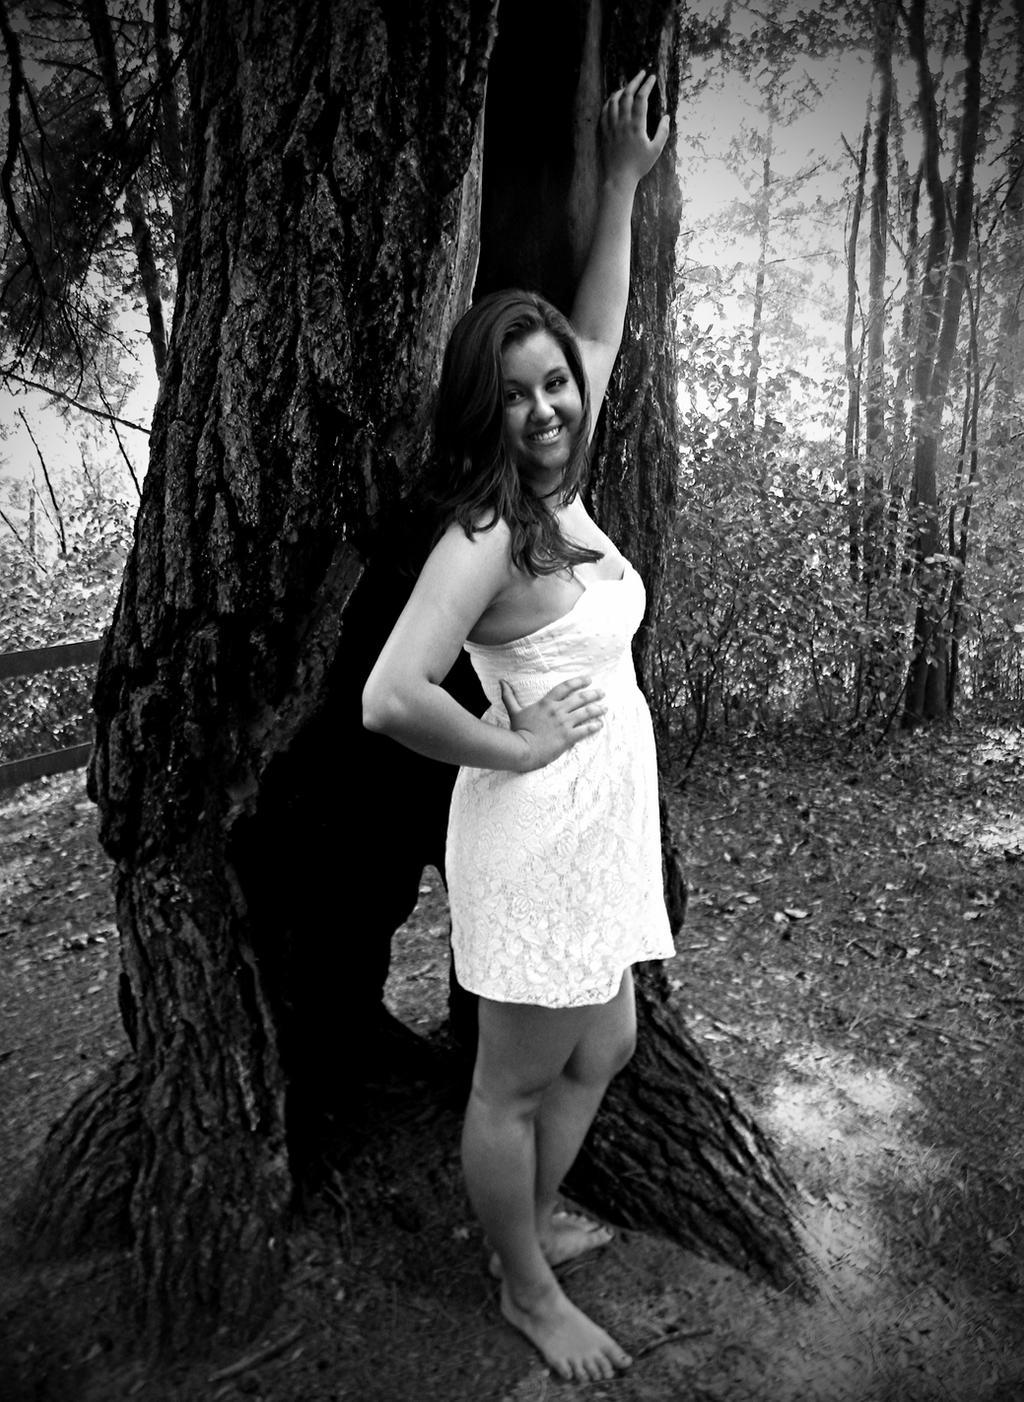 Stephymonsta's Profile Picture